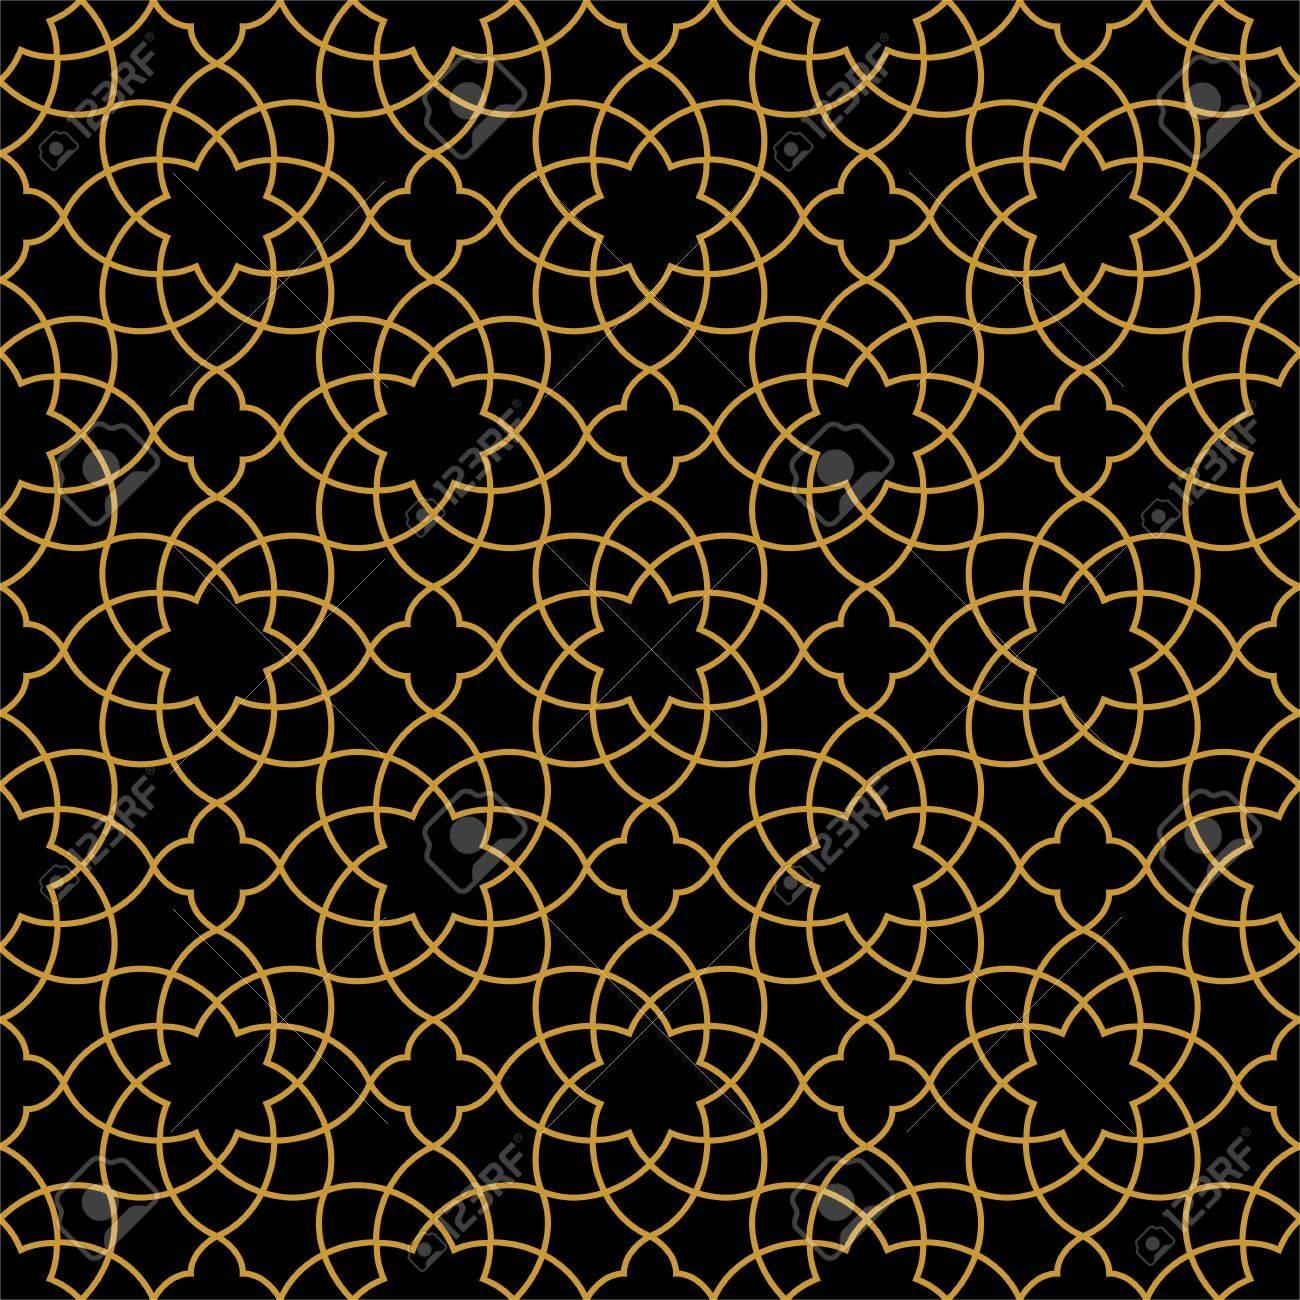 Gorgeous Seamless Arabic Pattern Design. Monochrome Gold Wallpaper or Background. - 63423642